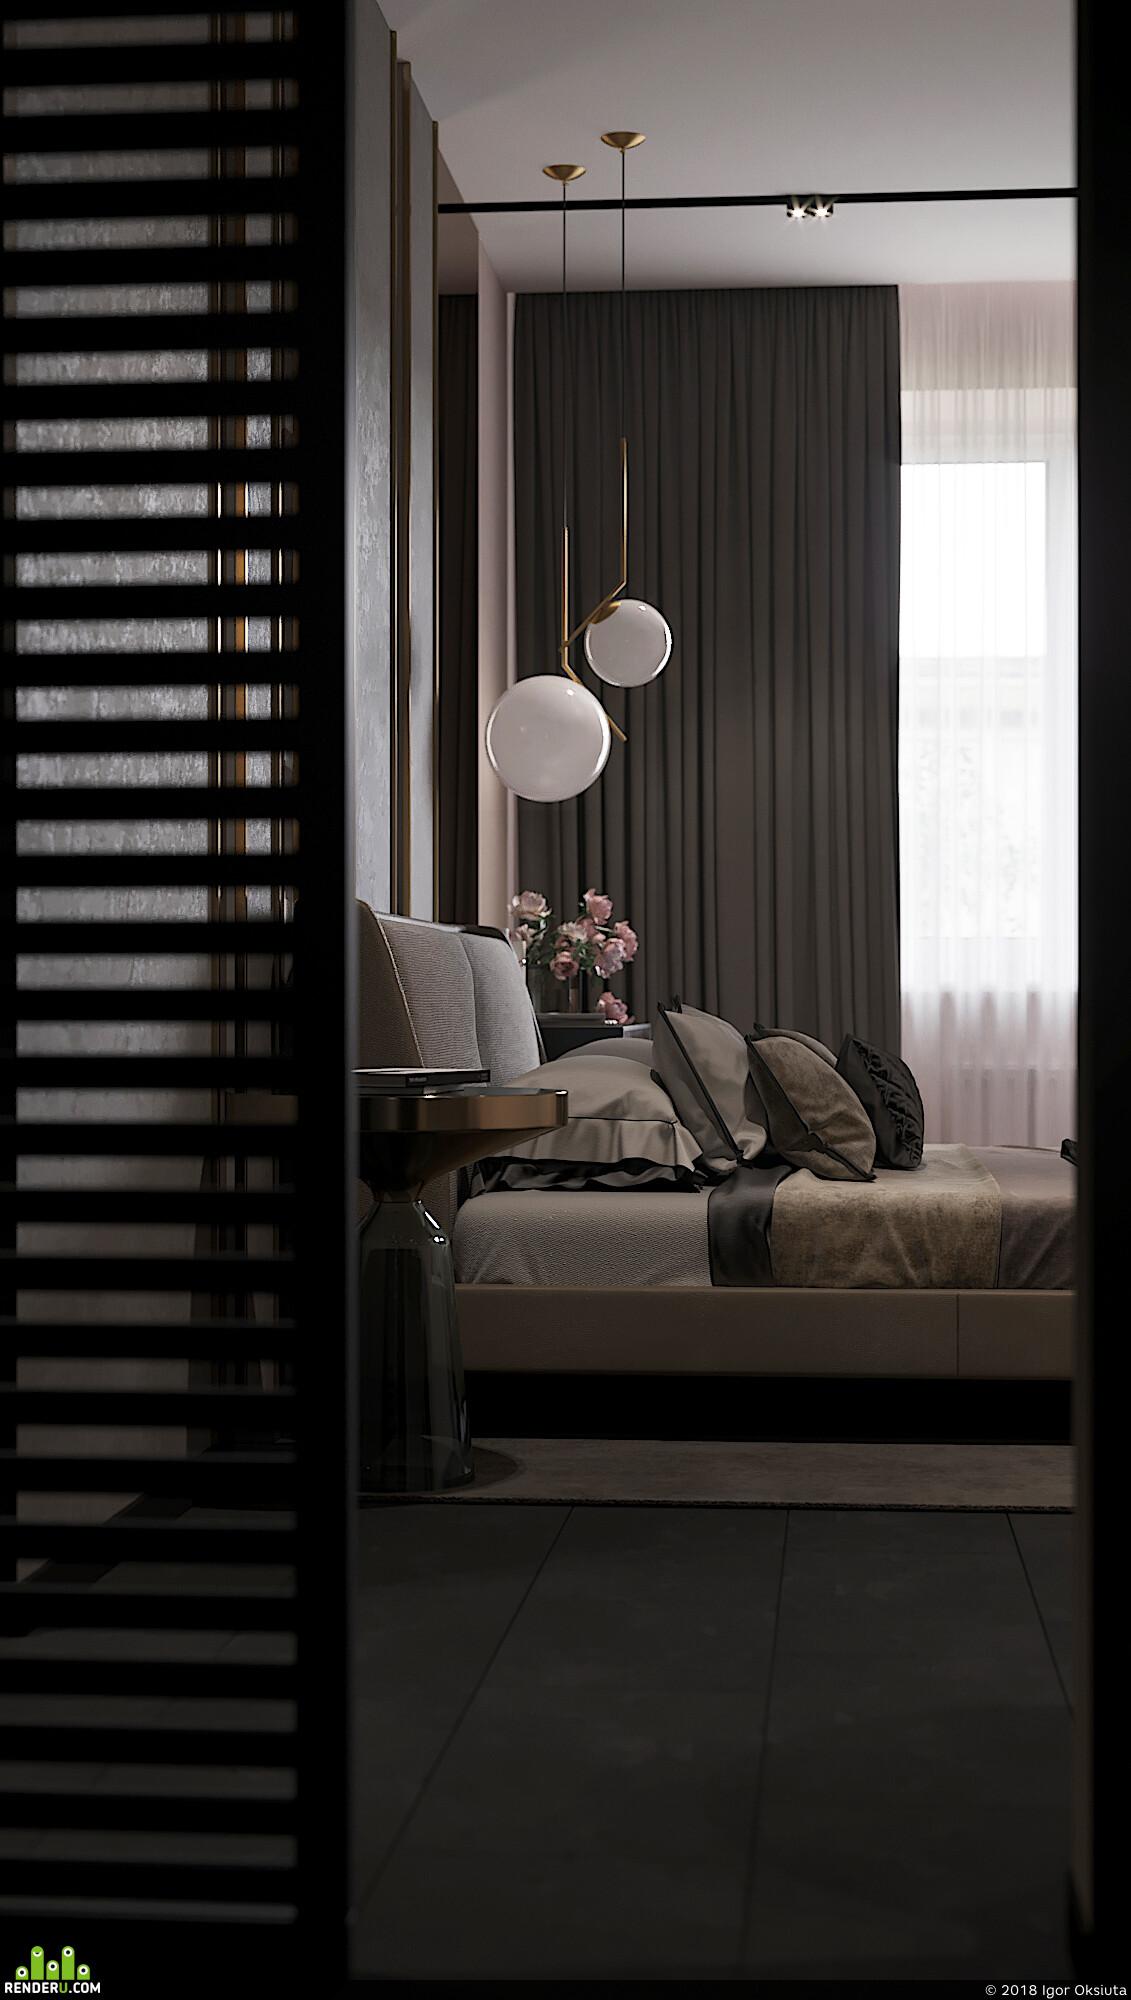 3д визуализация, интерьер, коронаренедер, Спальня, дизайн интерьера